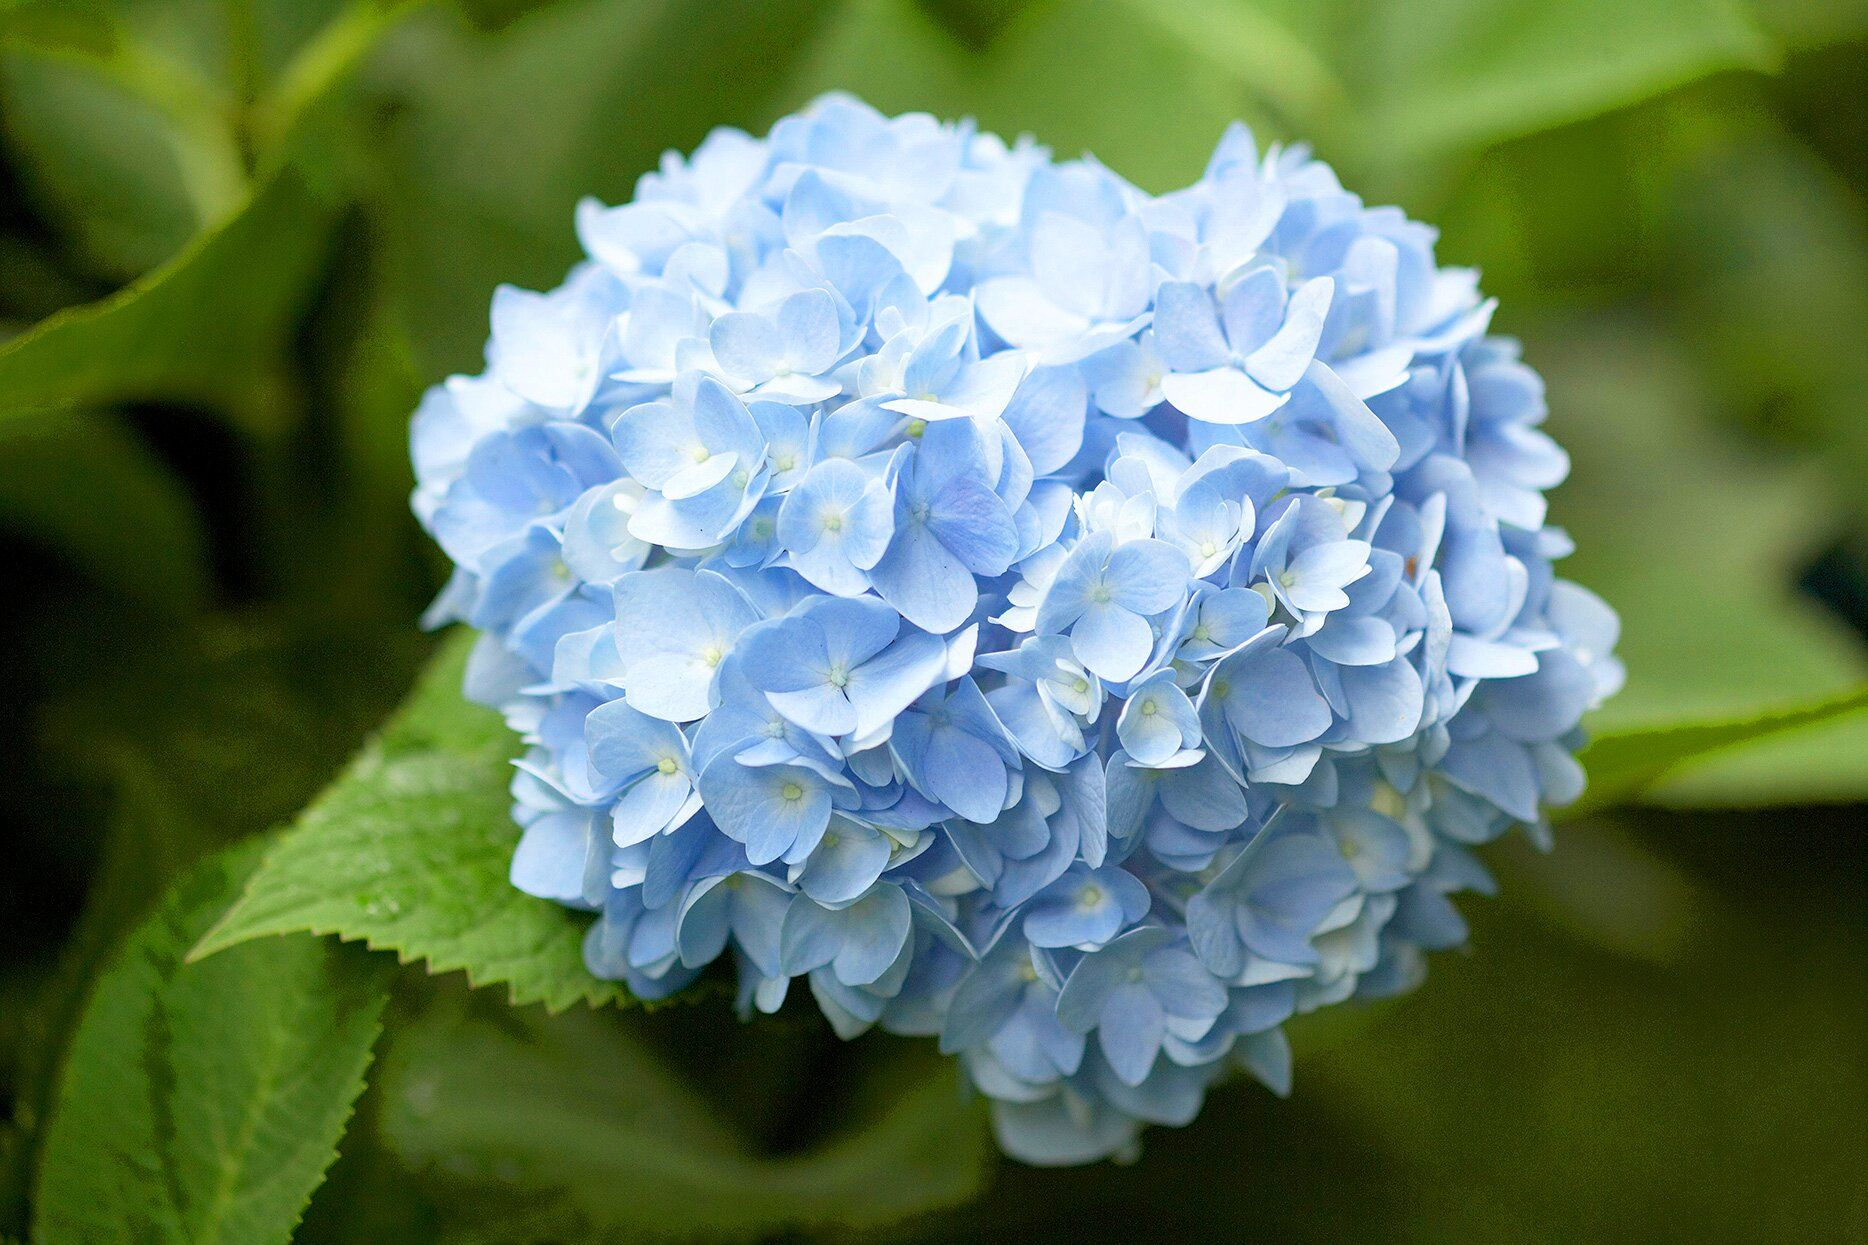 Vibrant Perennial Flowers That Bloom All Summer Hydrangea Varieties Flowers Perennials Smooth Hydrangea